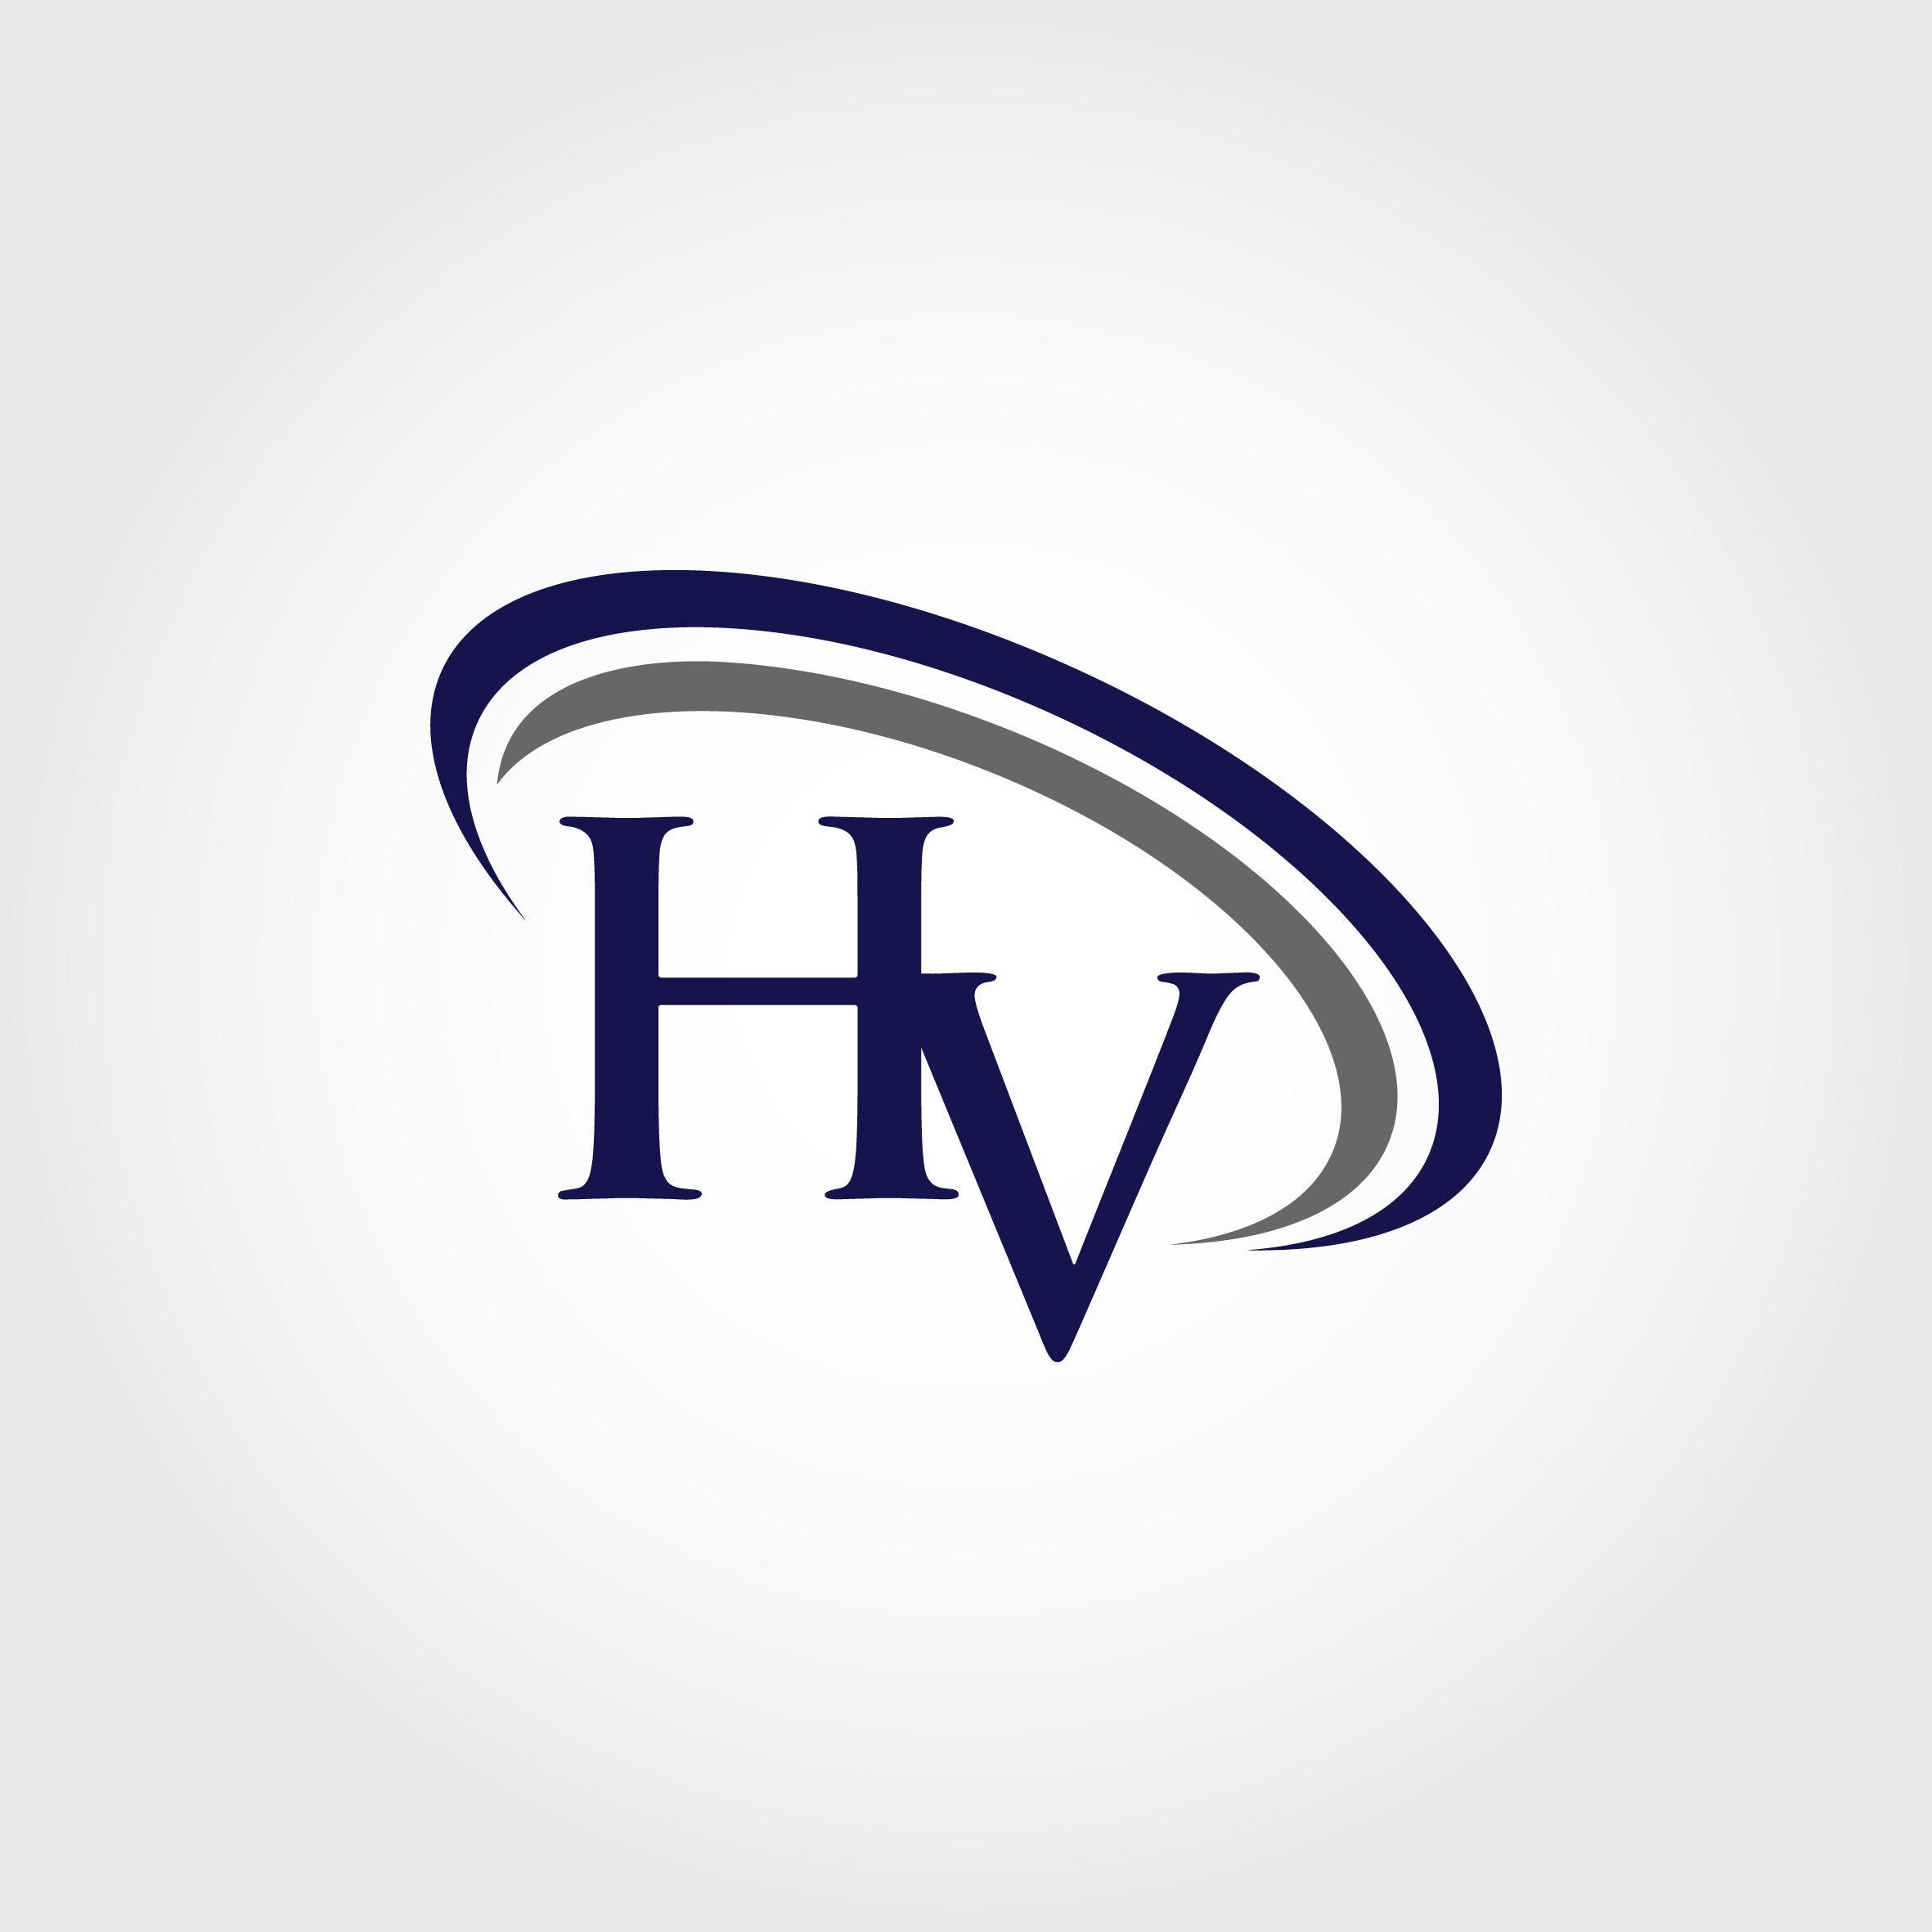 Monogram Hv Logo Design By Vectorseller Thehungryjpeg Com